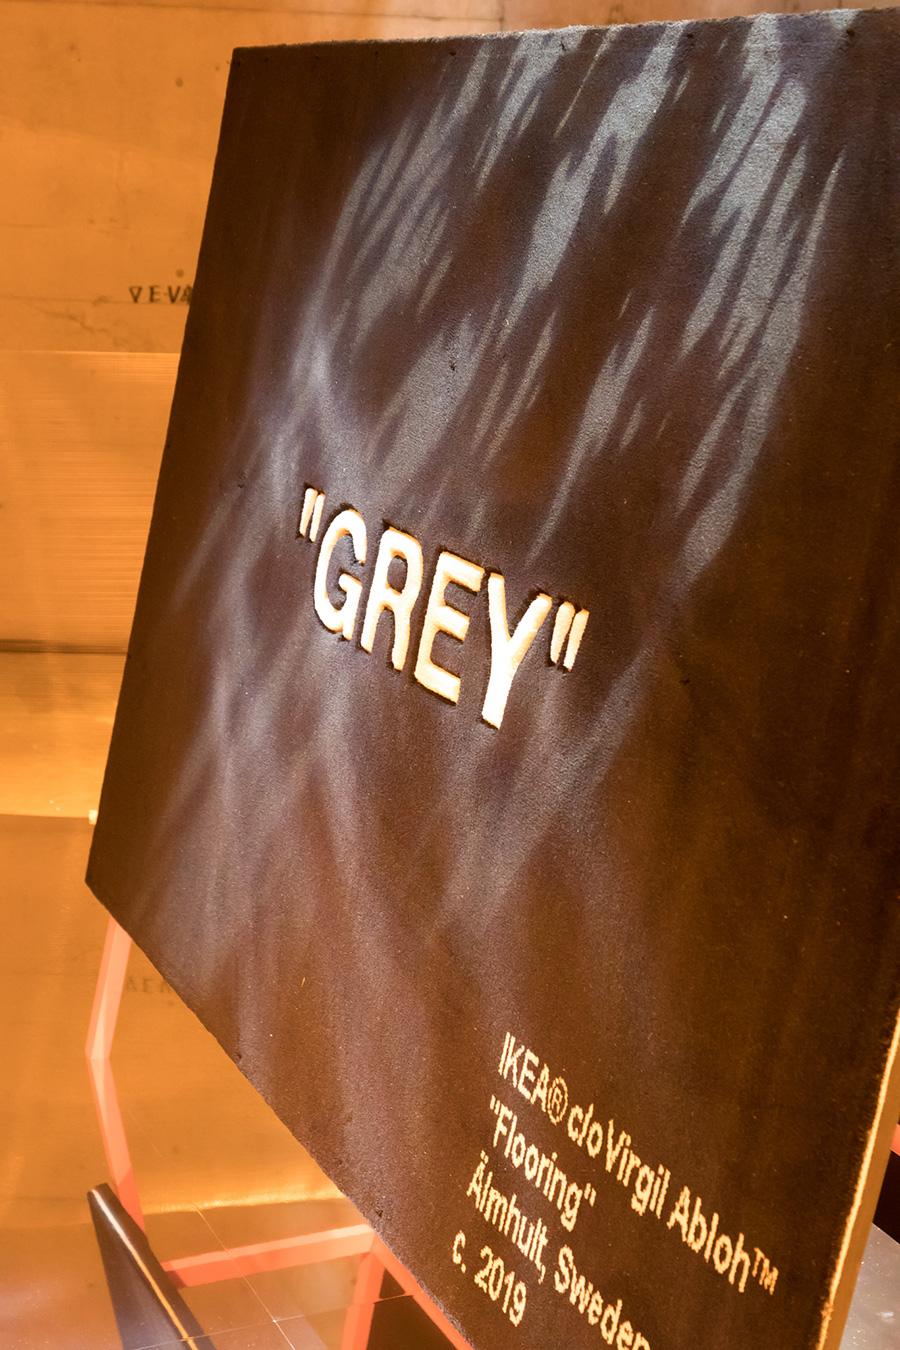 """GREY""の文字を浮き上がらせるように、職人が丁寧に文字の周囲をカットしている。"